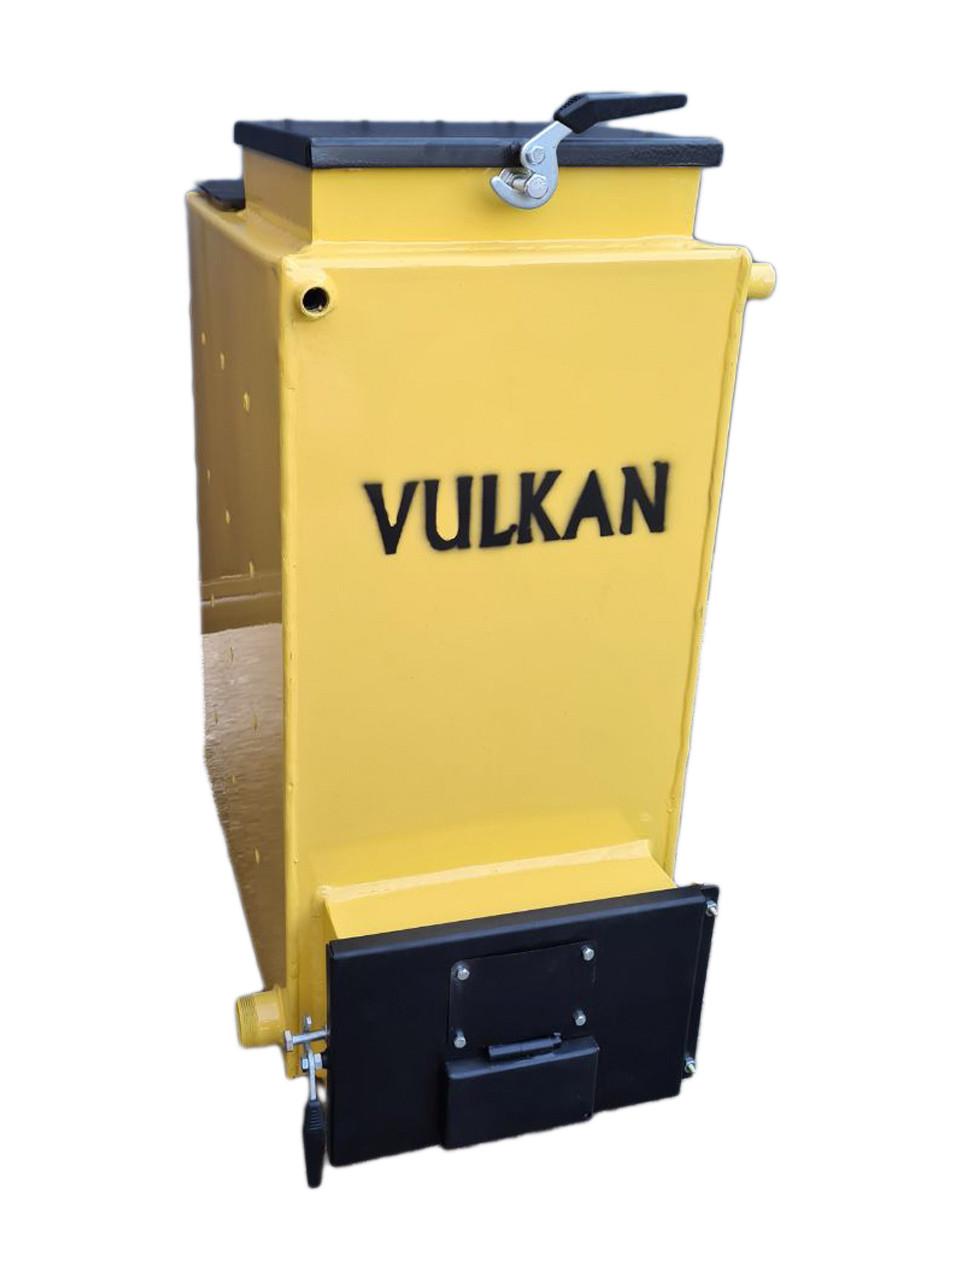 Котел Vulkan EKO 10 кВт твердопаливний шахтний (Холмова).Безкоштовна доставка!